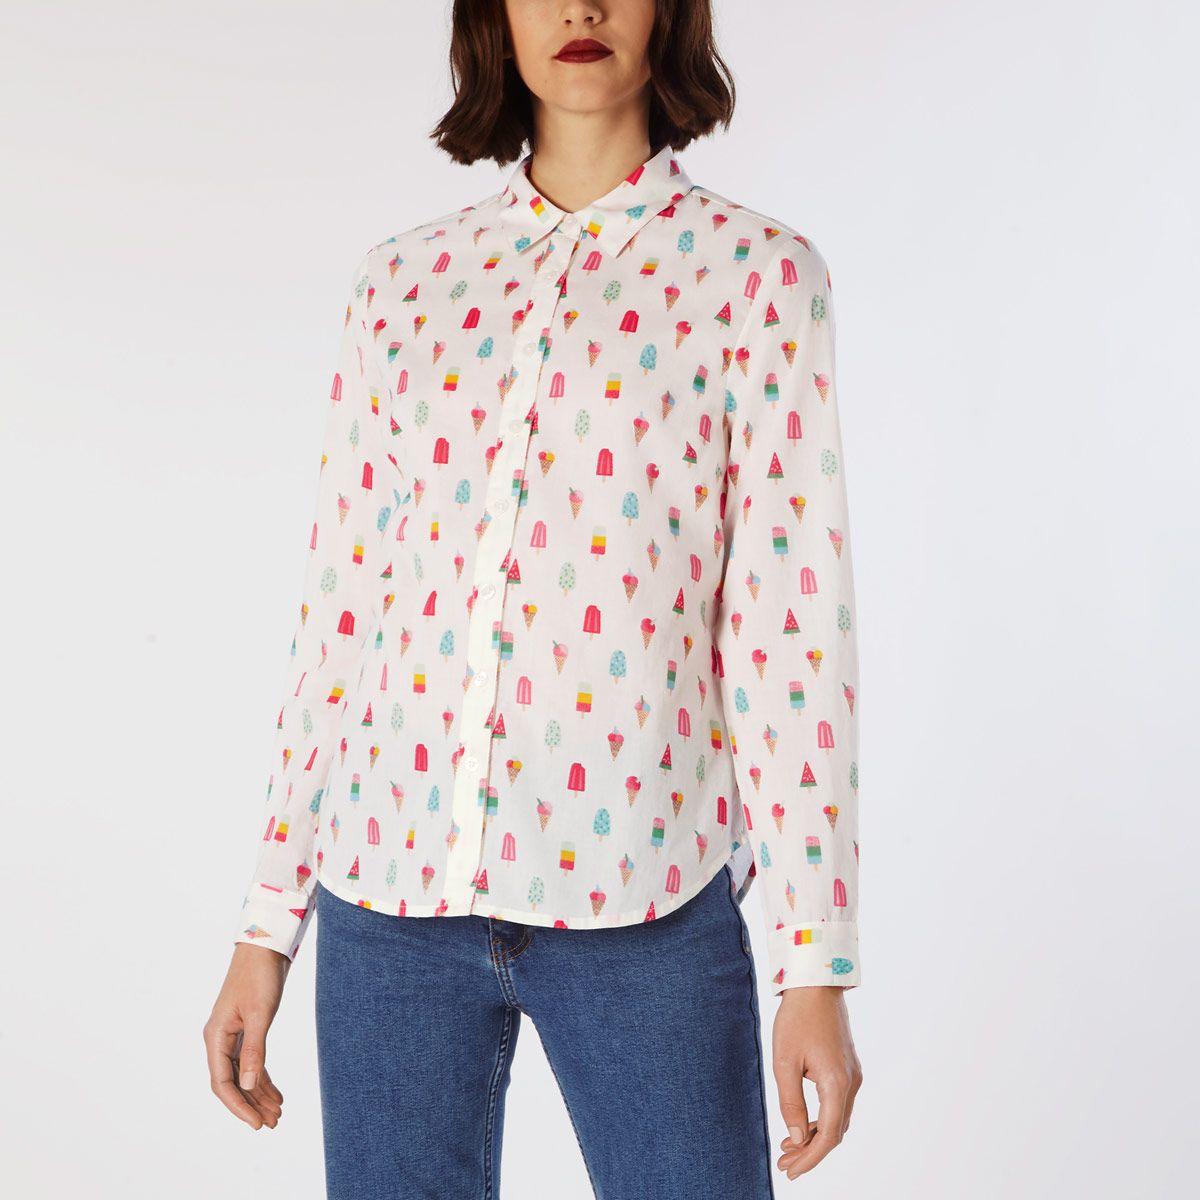 9b4a8610c4ea Lollies Cotton Shirt   Tops & Blouses   CathKidston   Fashion ...